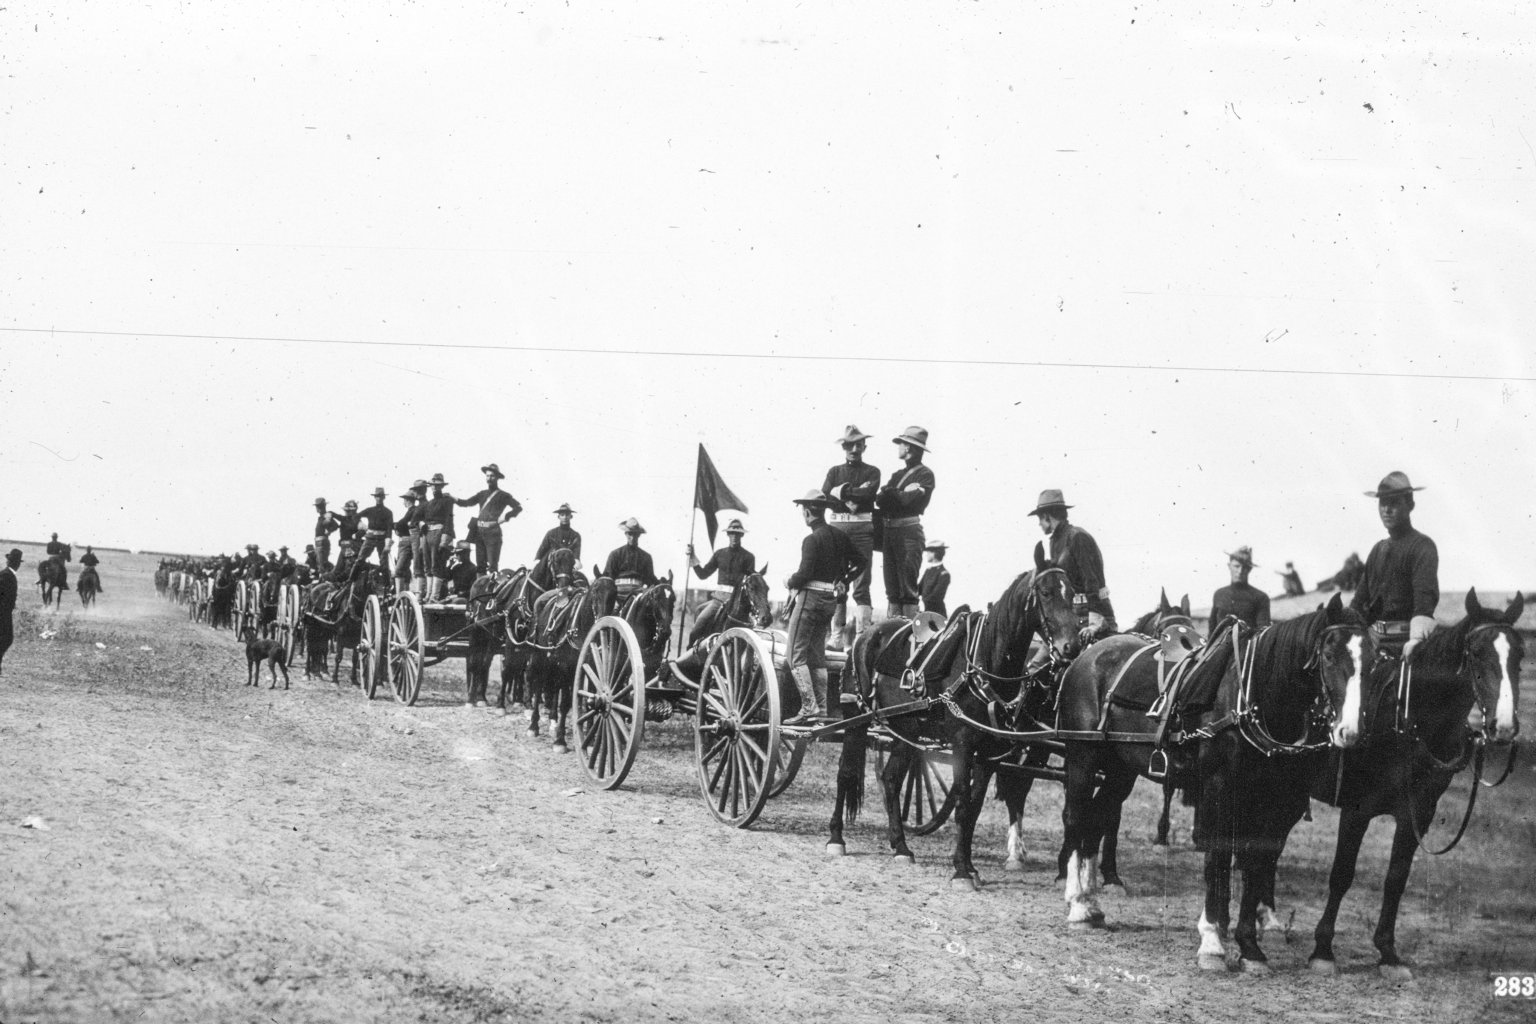 13th Battery Field Artillery